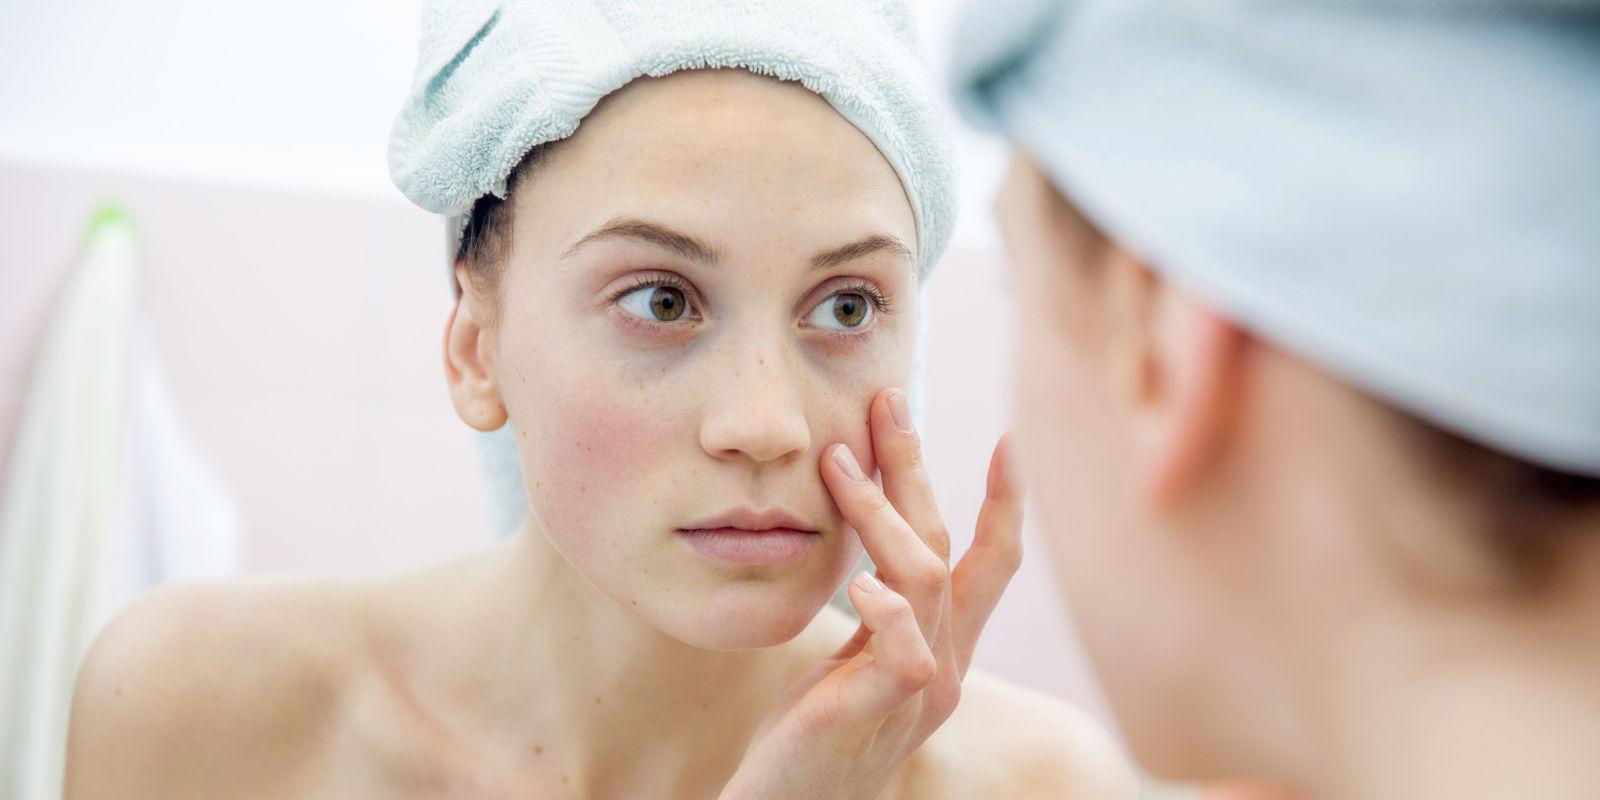 6 Blotchy Skin Causes